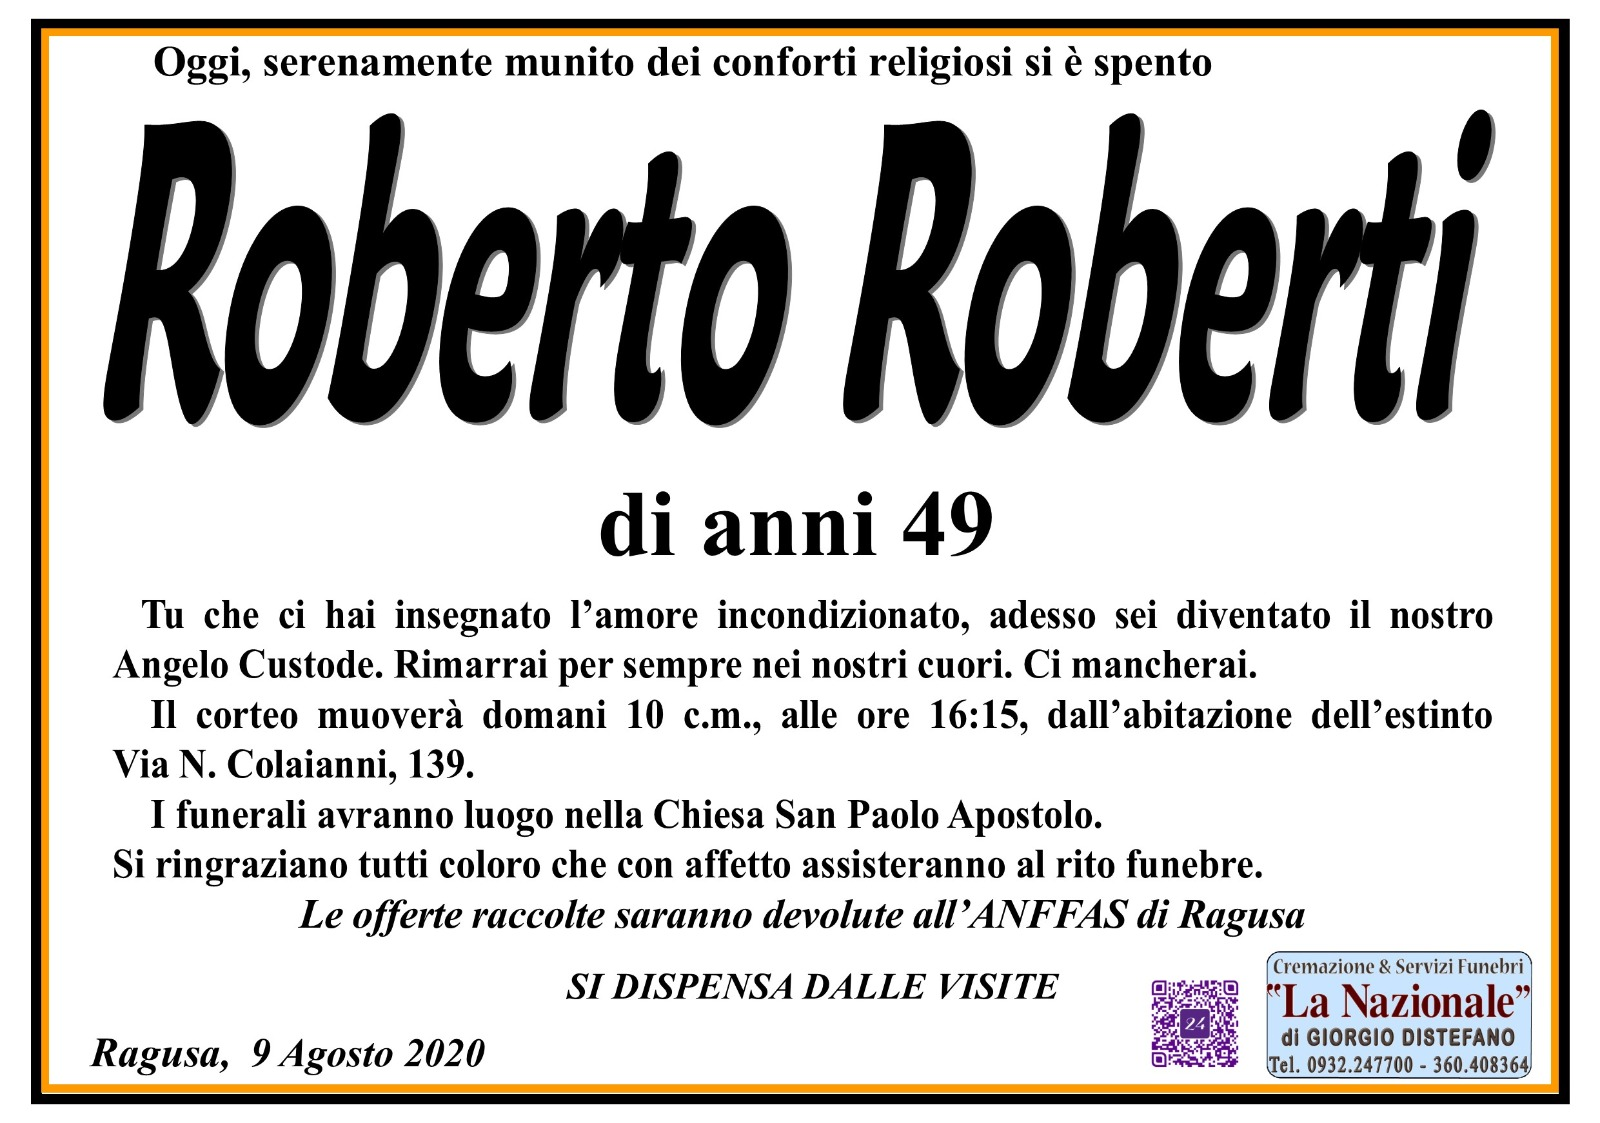 Funerali E Annunci Funebri A Ragusa Roberto Roberti Funer24